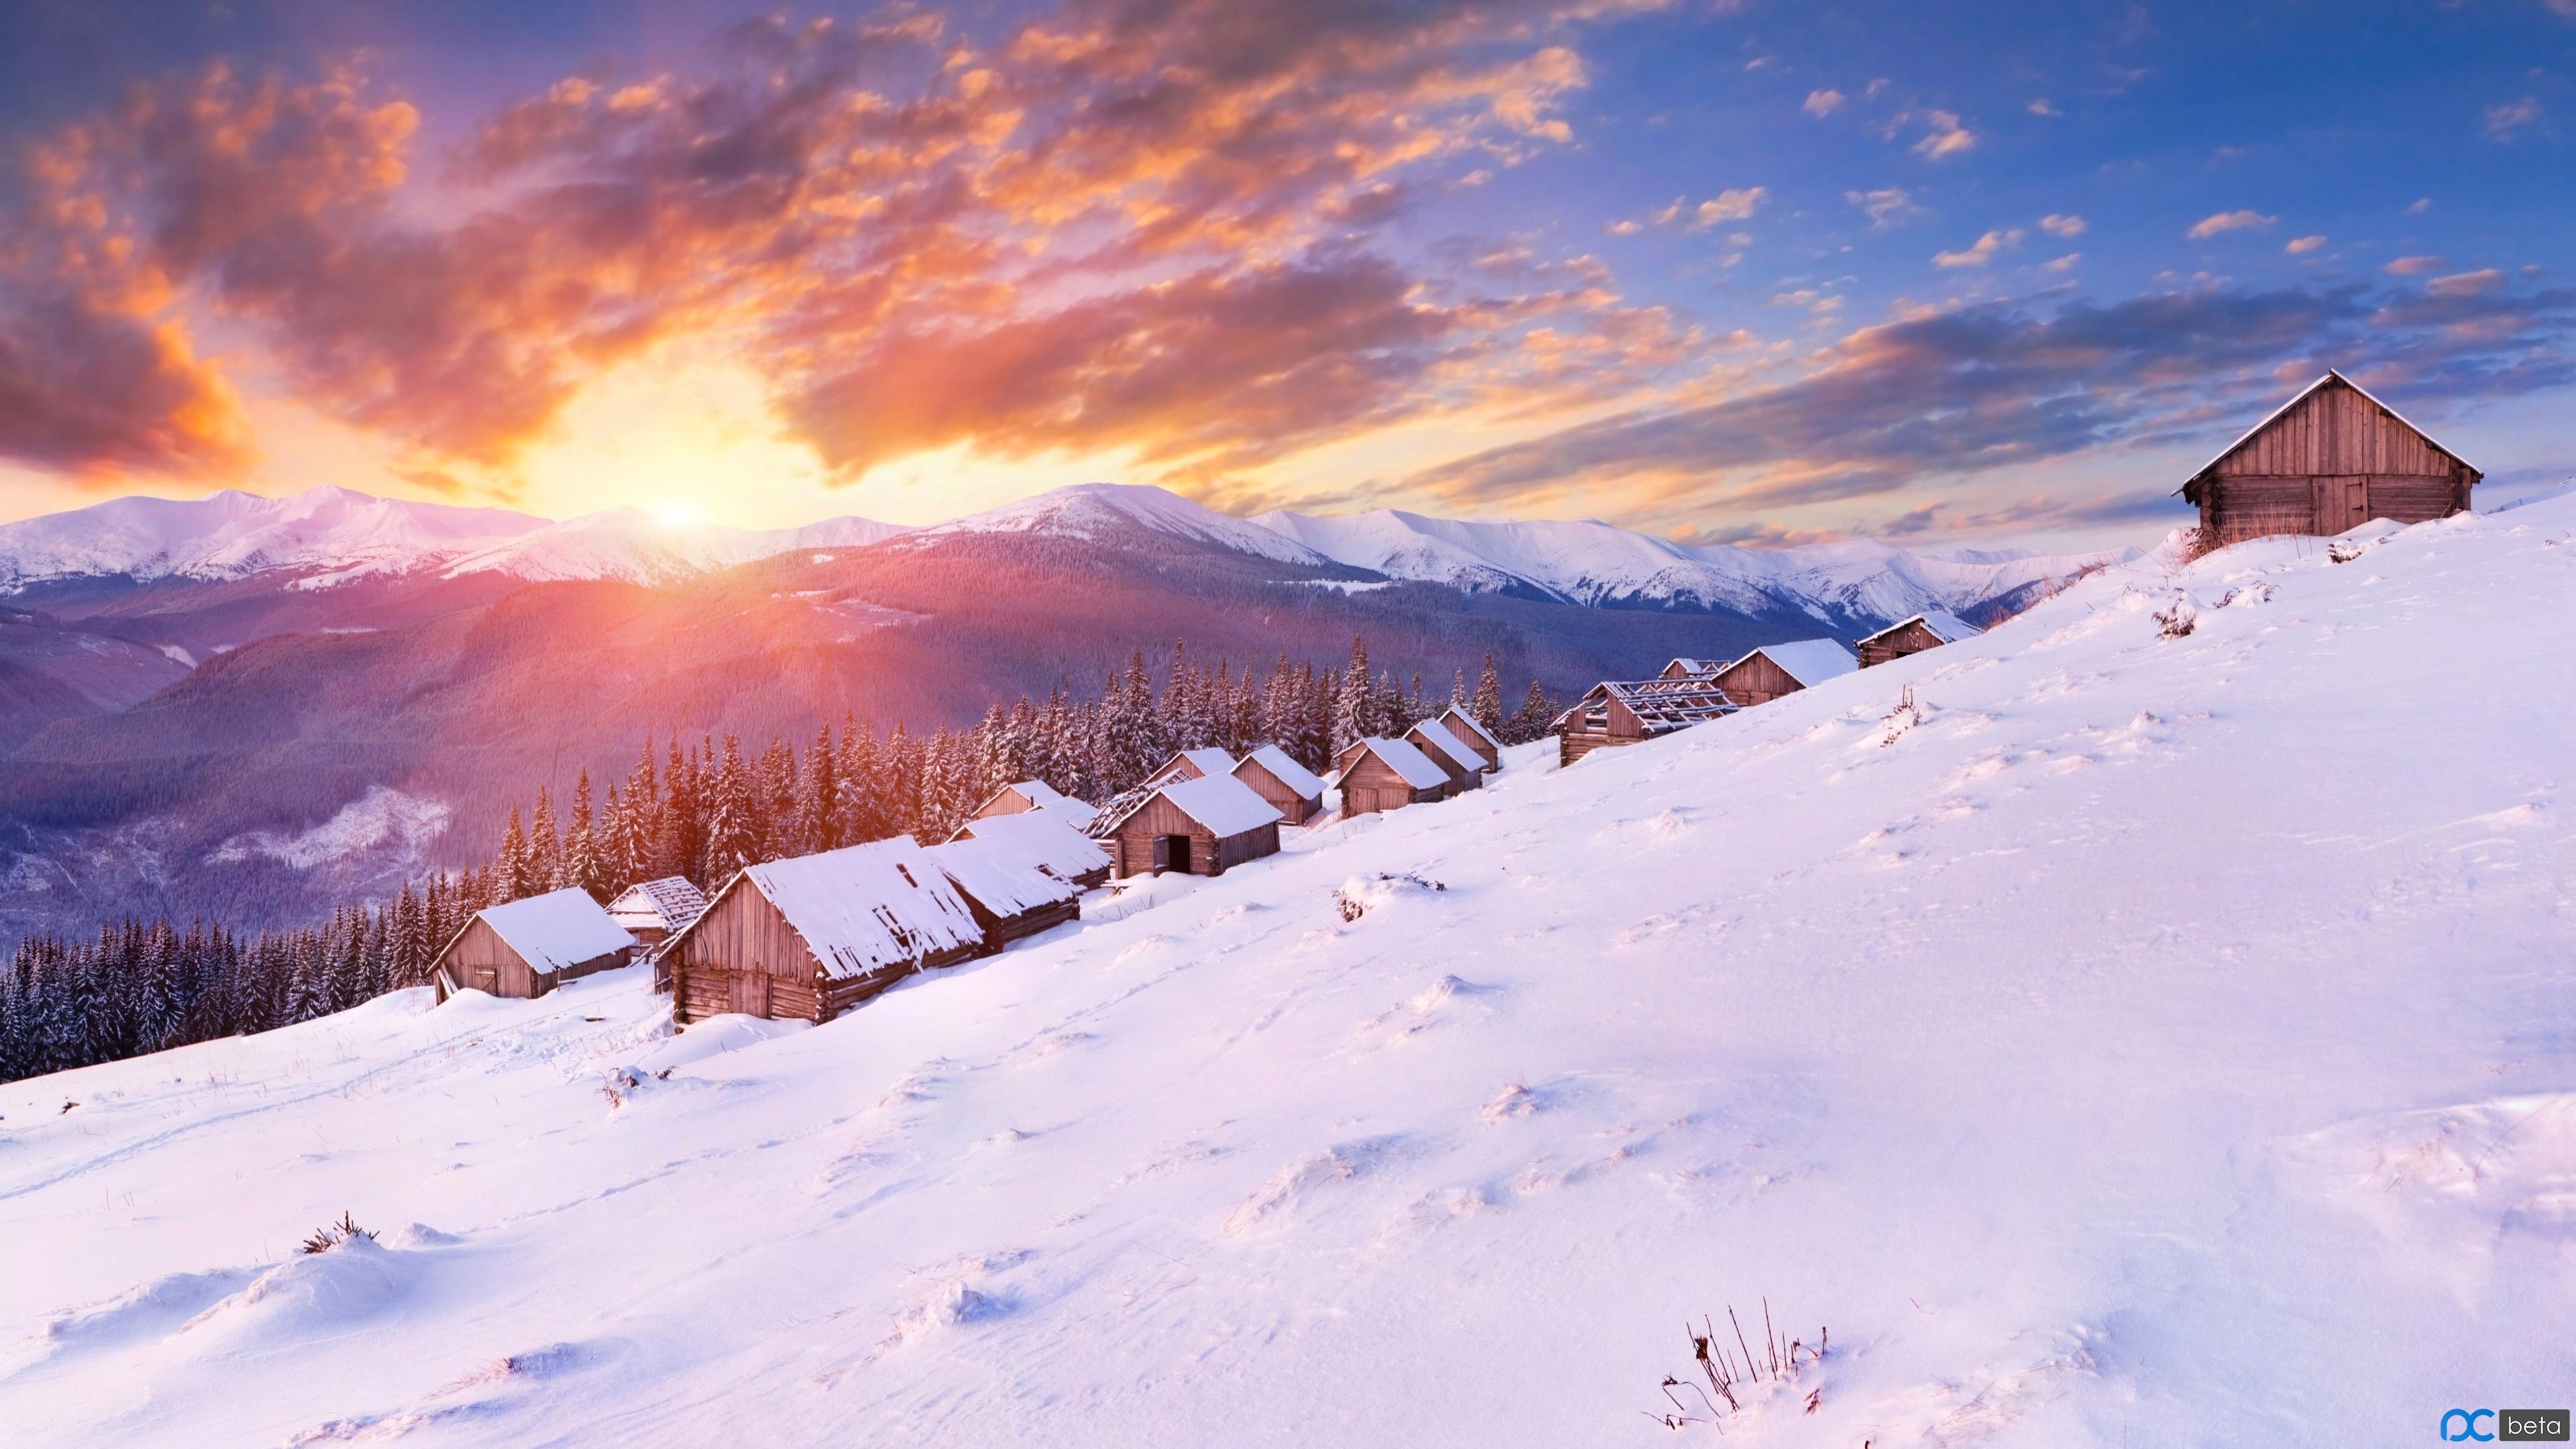 mountains-3840x2160-5k-4k-wallpaper-hills-sunset-snow-winter-house-5699.jpg